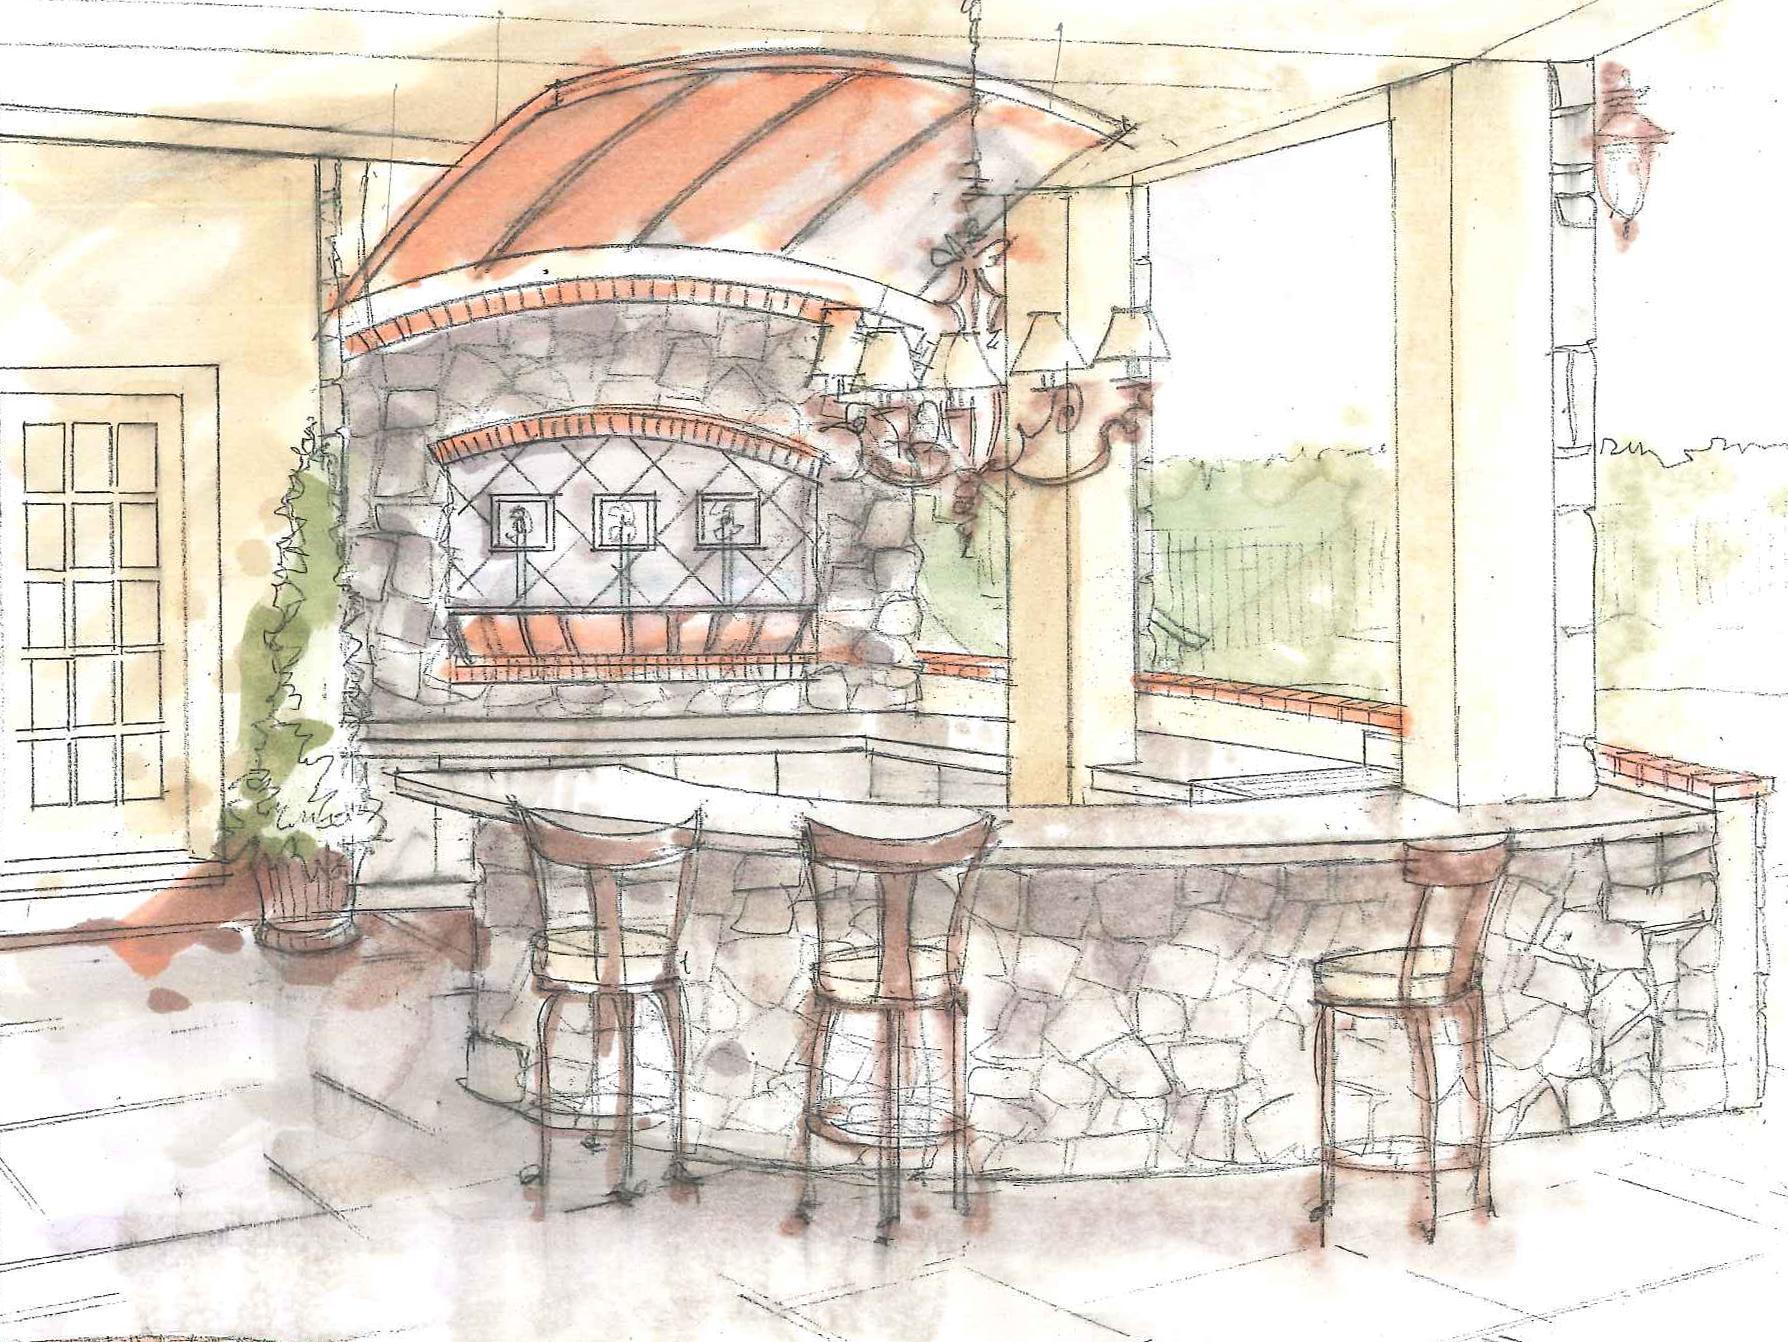 outdoor-bar-lighting-formal-design-concept-sketch-wayne-pa